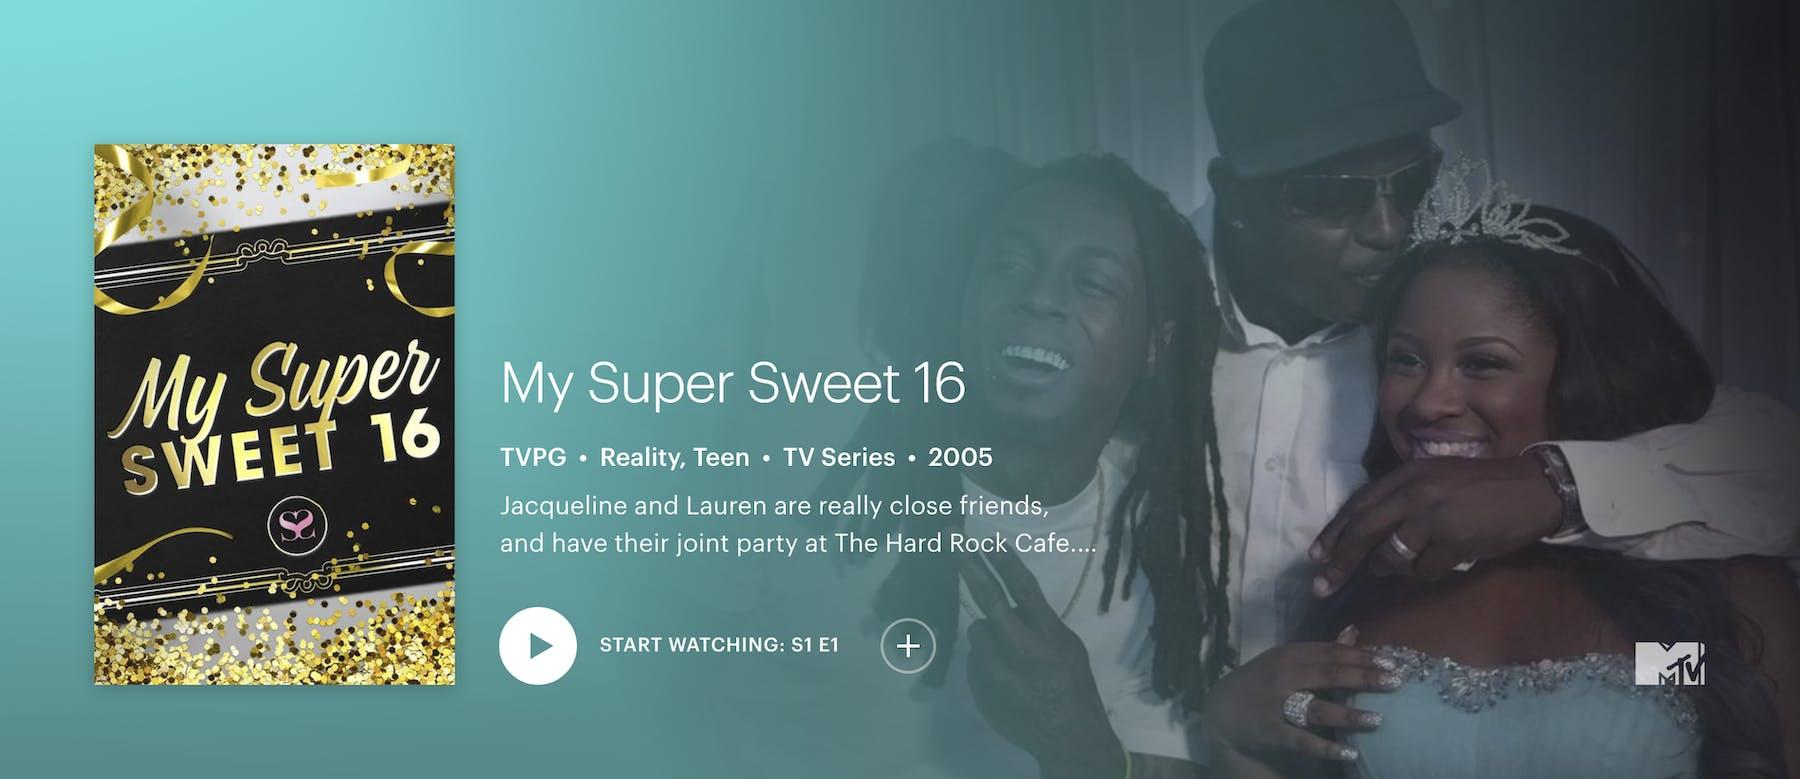 how to stream my super sweet 16 on Hulu